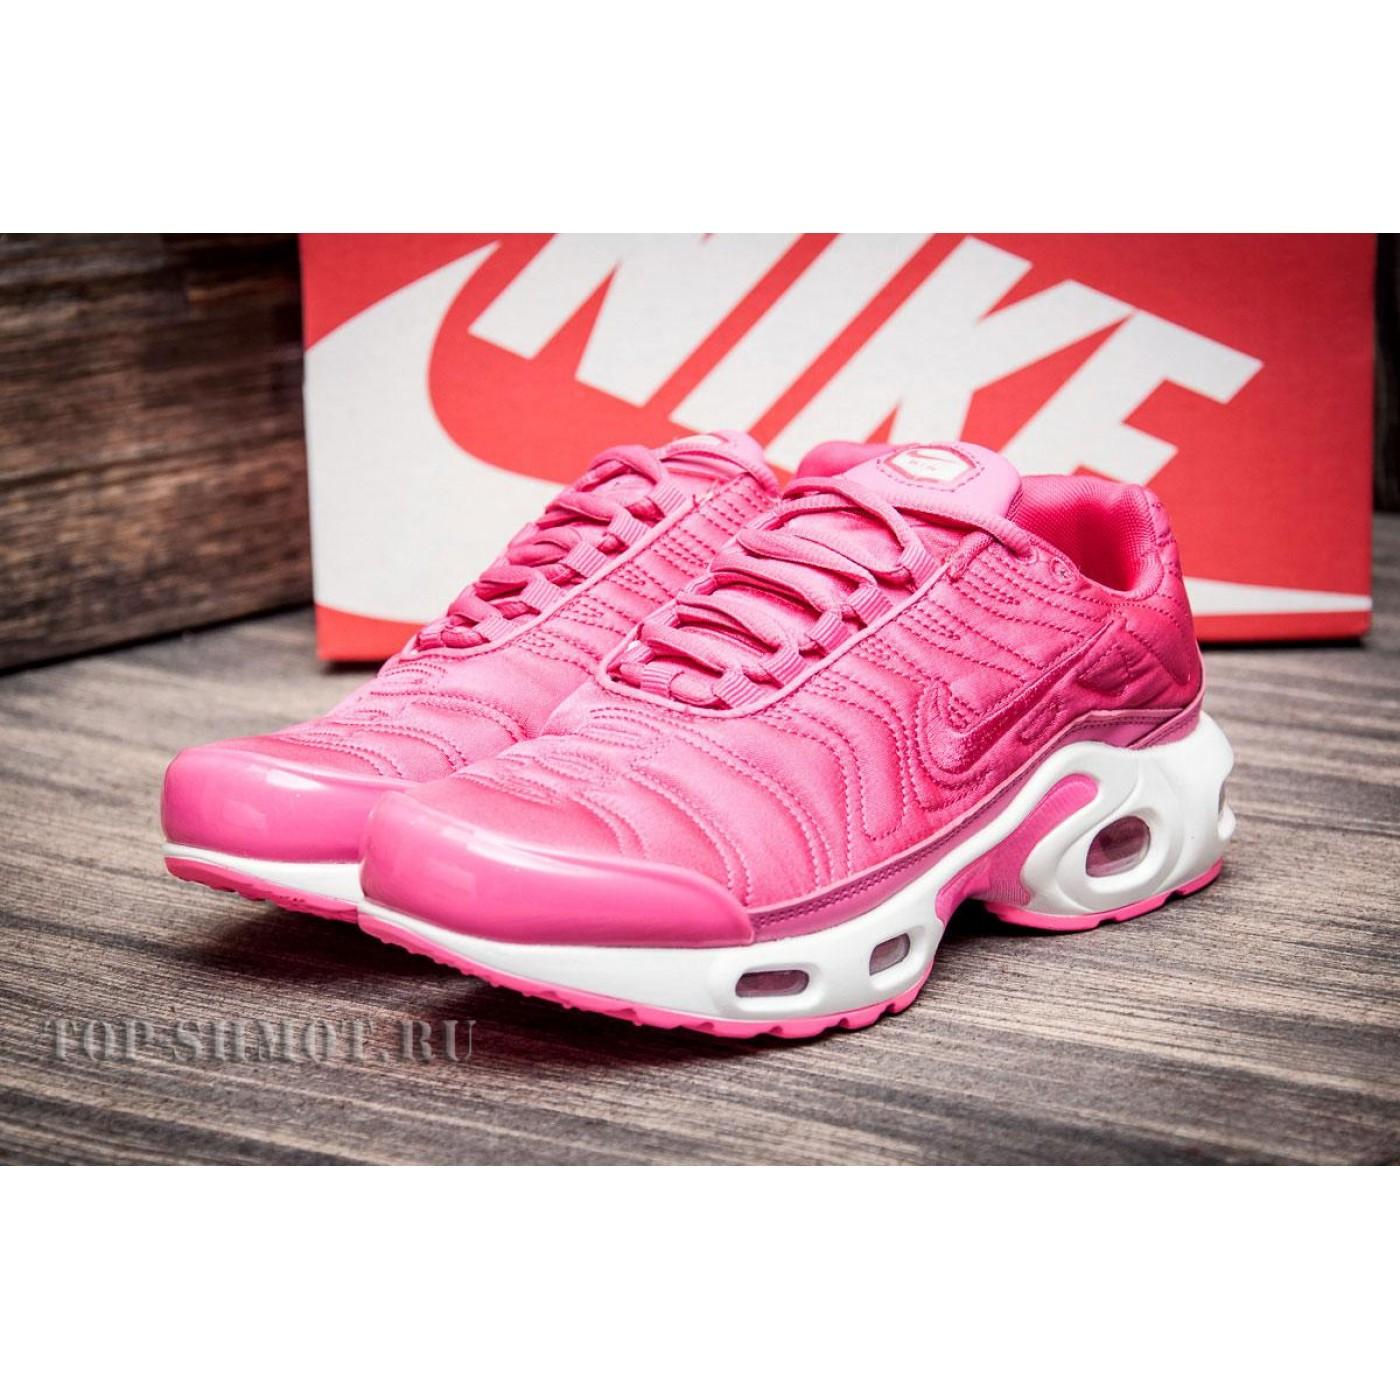 7a1d8bc6 Кроссовки женские Nike Air Max Tn plus, розовые (2550-3) размеры в